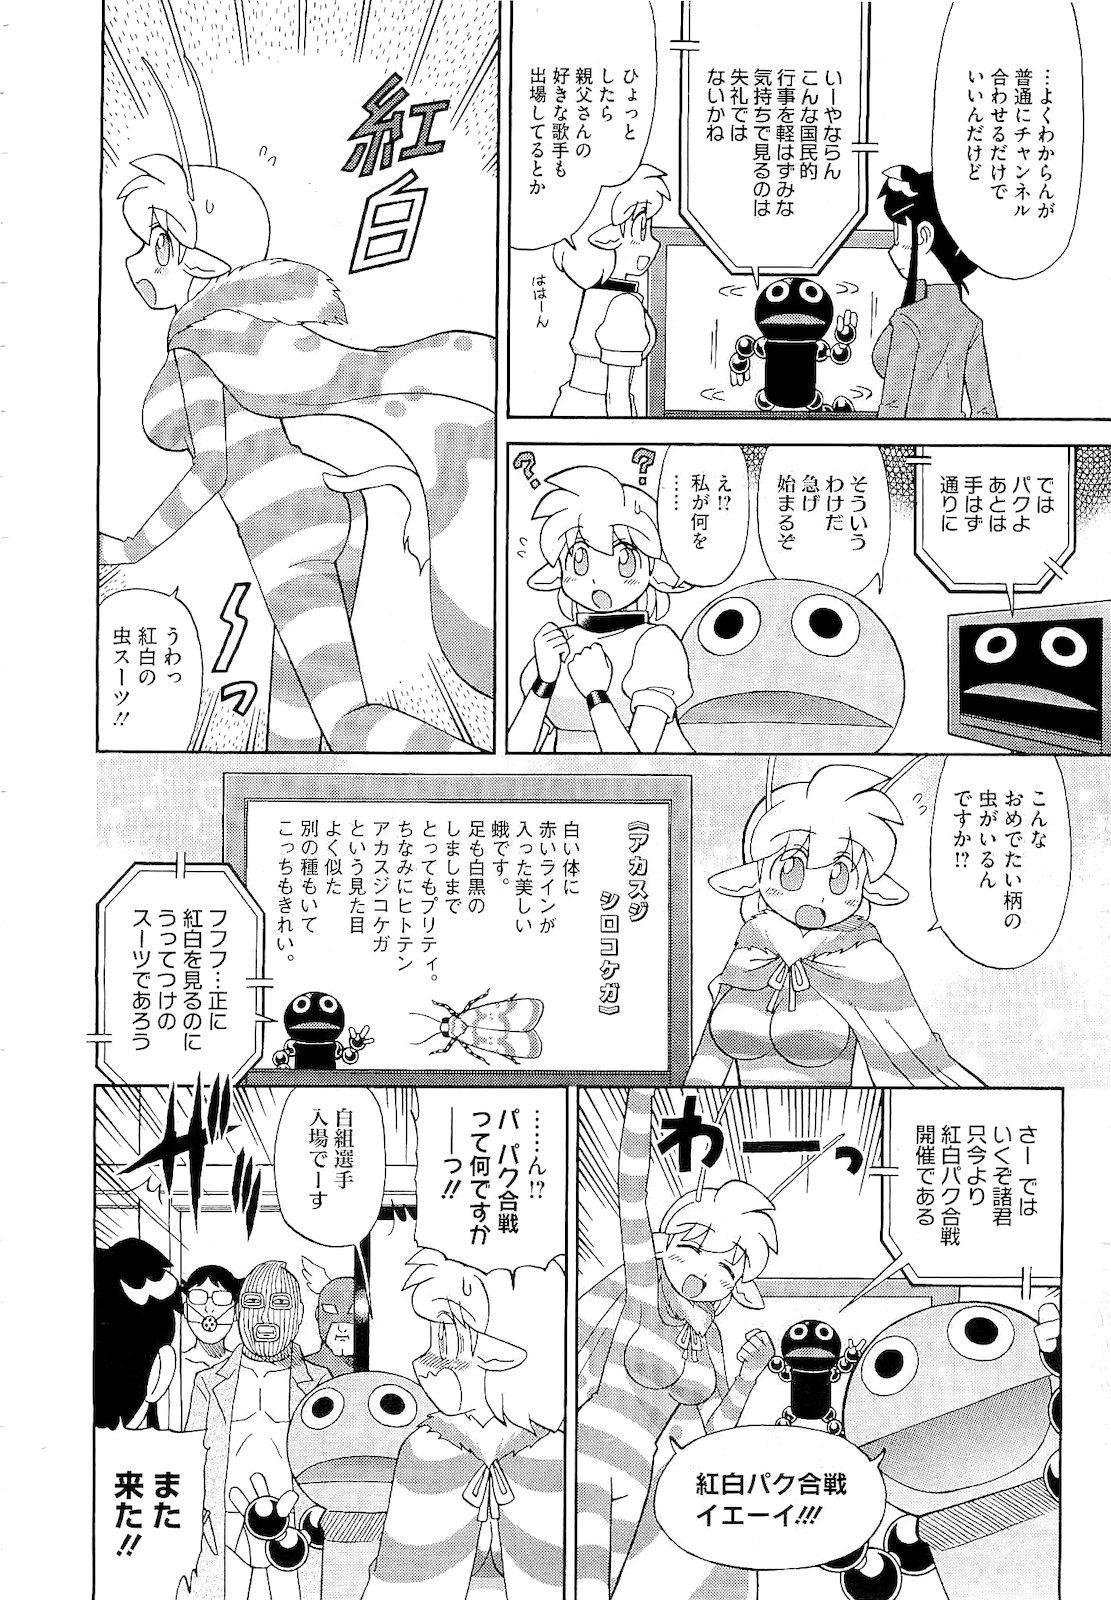 COMIC Megastore 2011-02 511